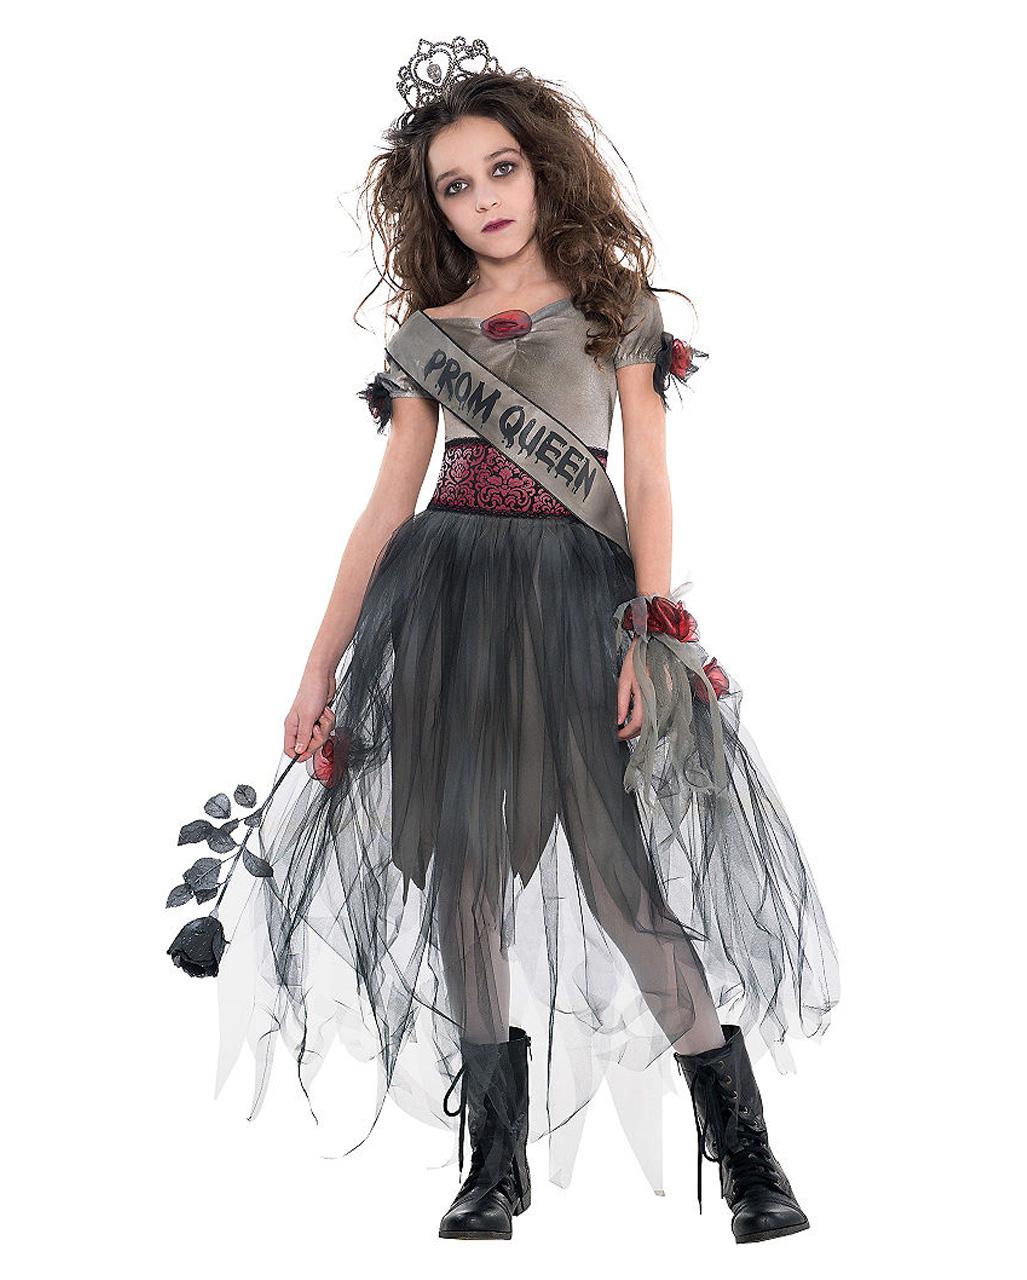 Mädchen Zombie Queen Halloween Kostüm Teenager Zombie Ball Party Outfit